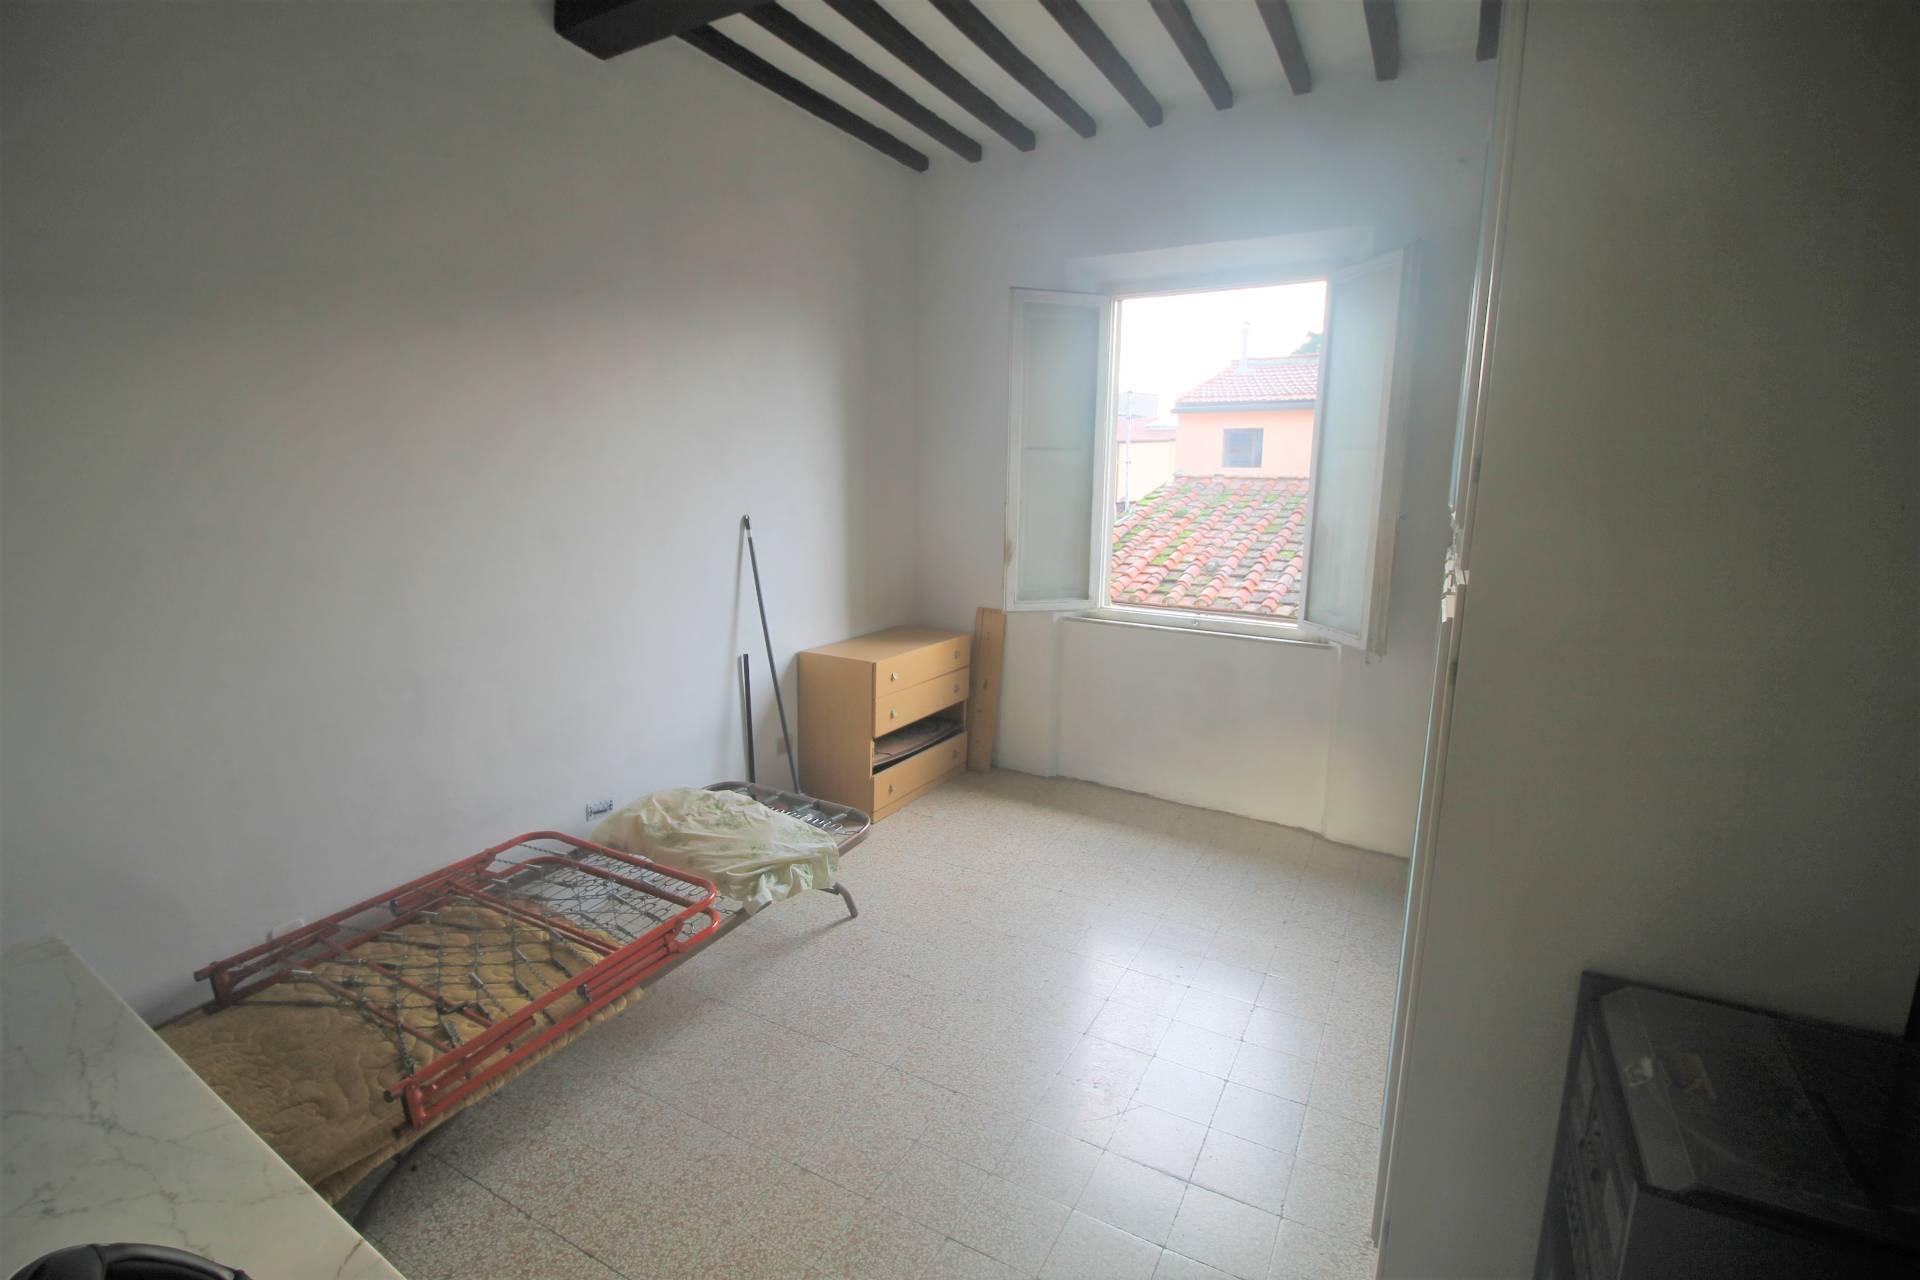 Appartamento in vendita, rif. V2765b